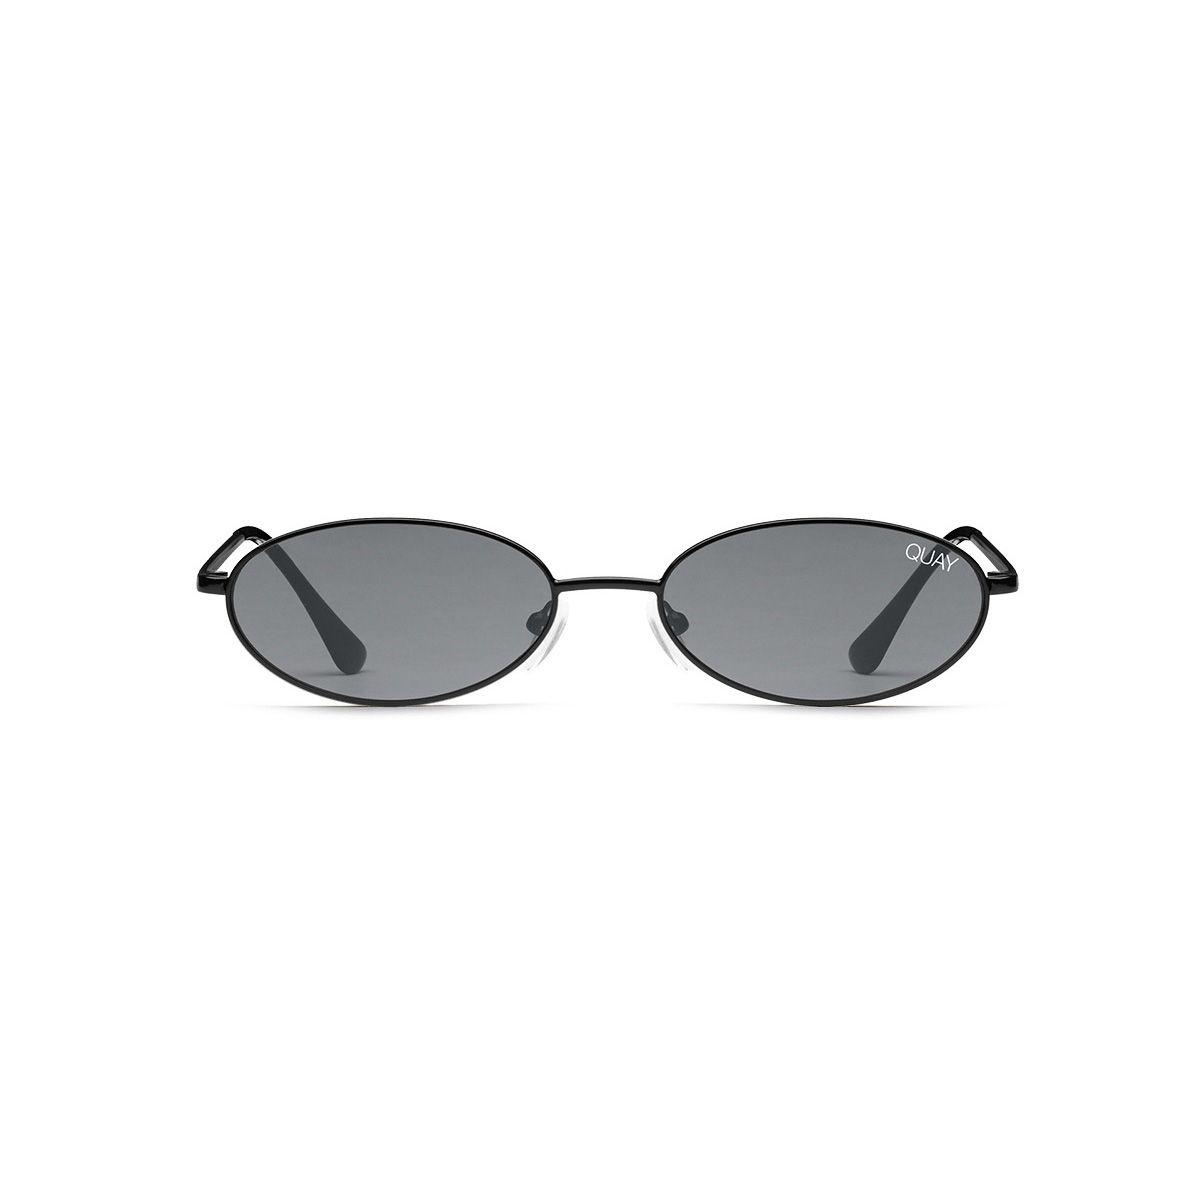 9f0b8bd4efe Pin by 2bella on Quay Australia Clout Sunglasses!